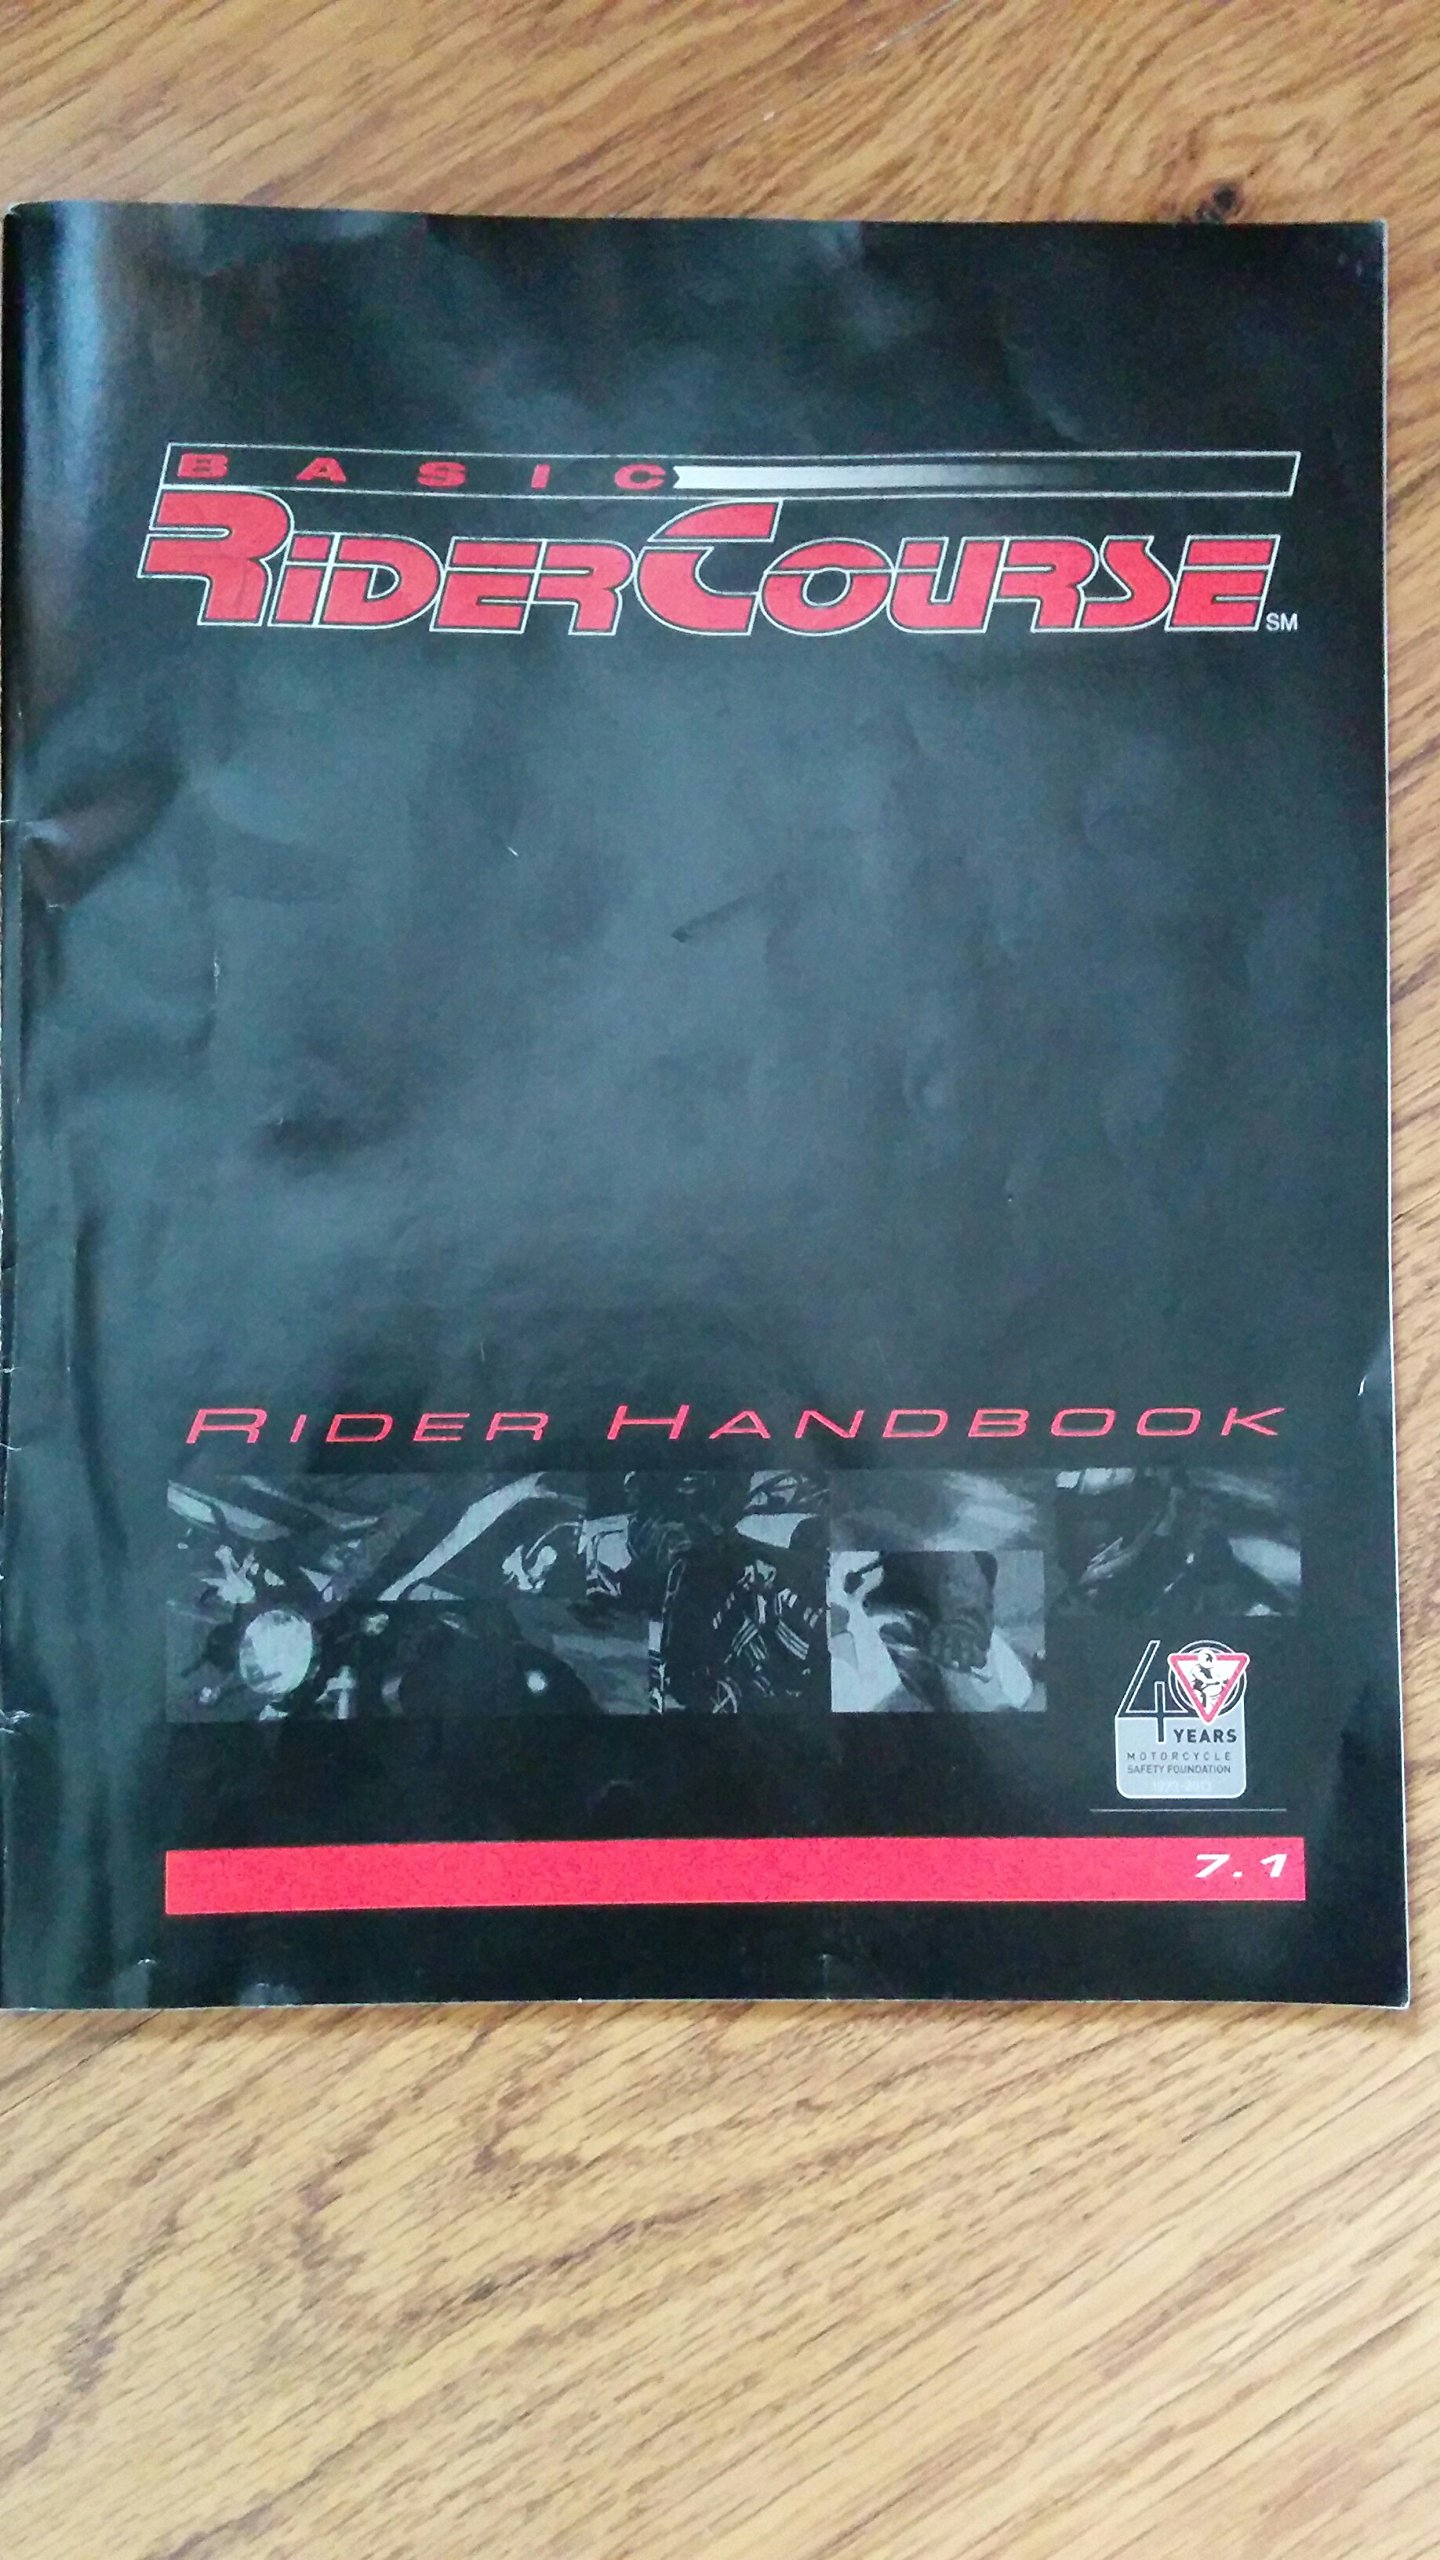 MSF Basic Rider Course: Rider Handbook, Edition 7 1 [2009